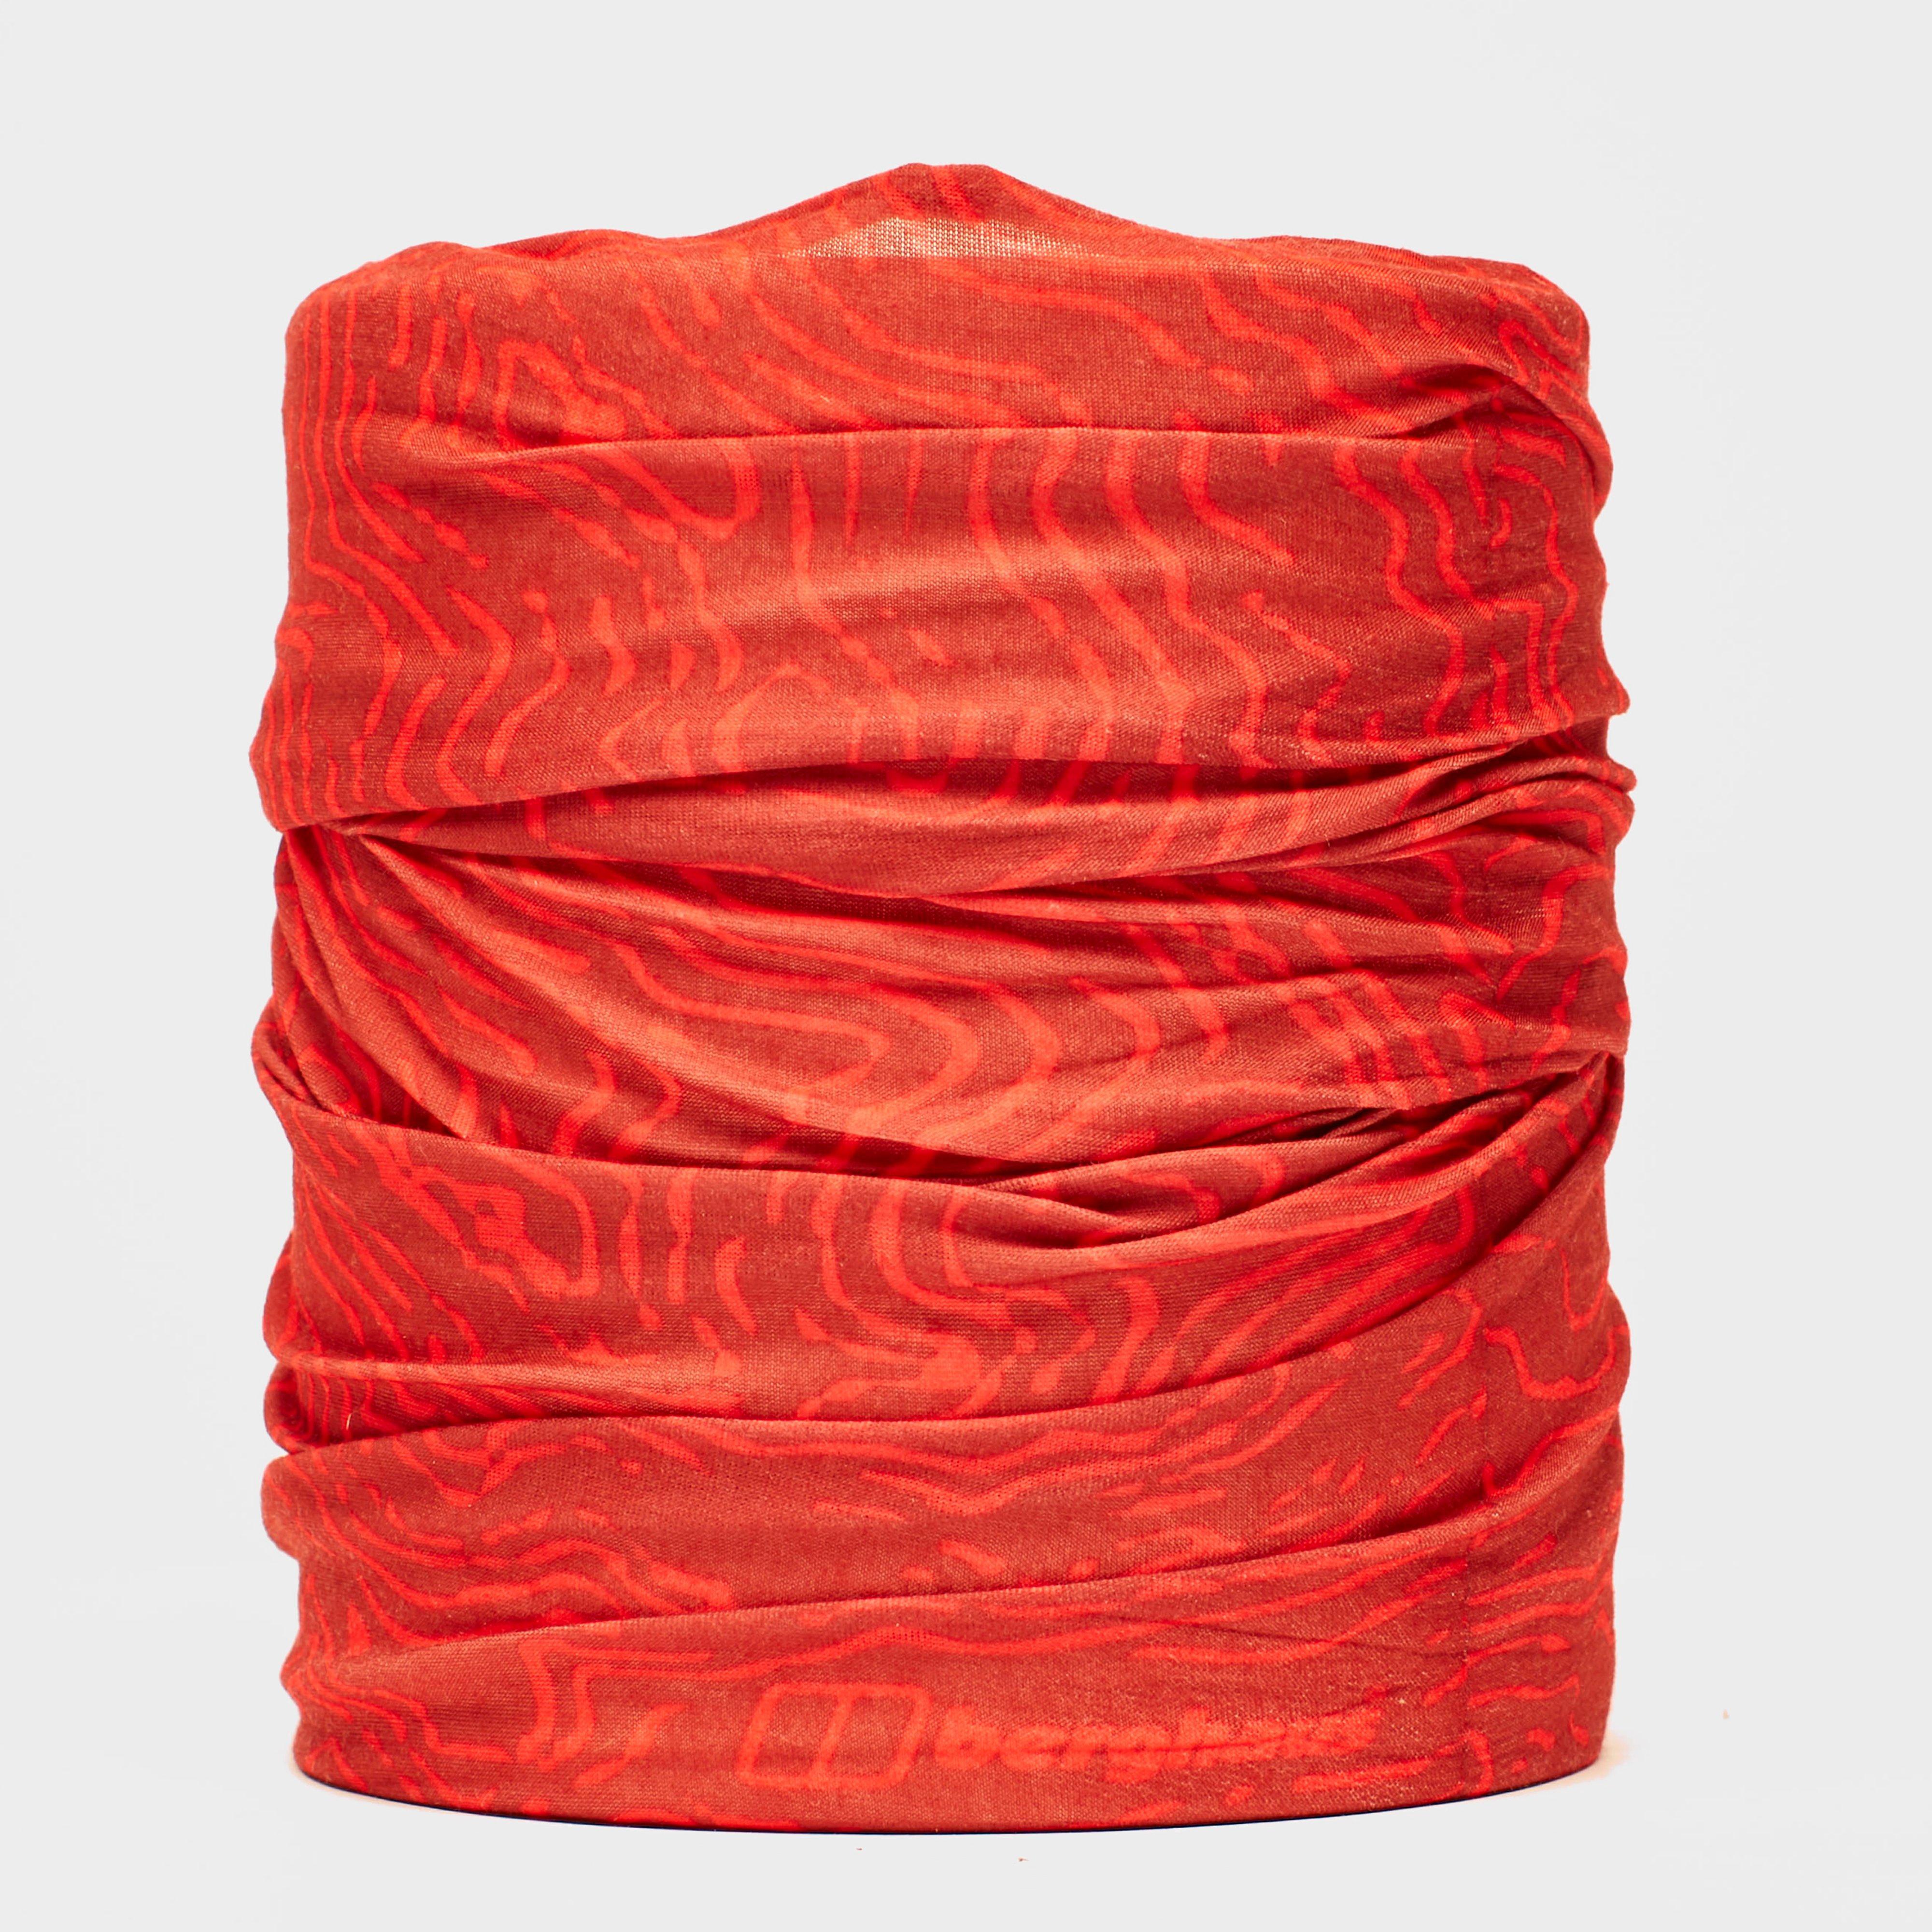 Berghaus Unisex Contour Neck Gaiter - Red/rd  Red/rd